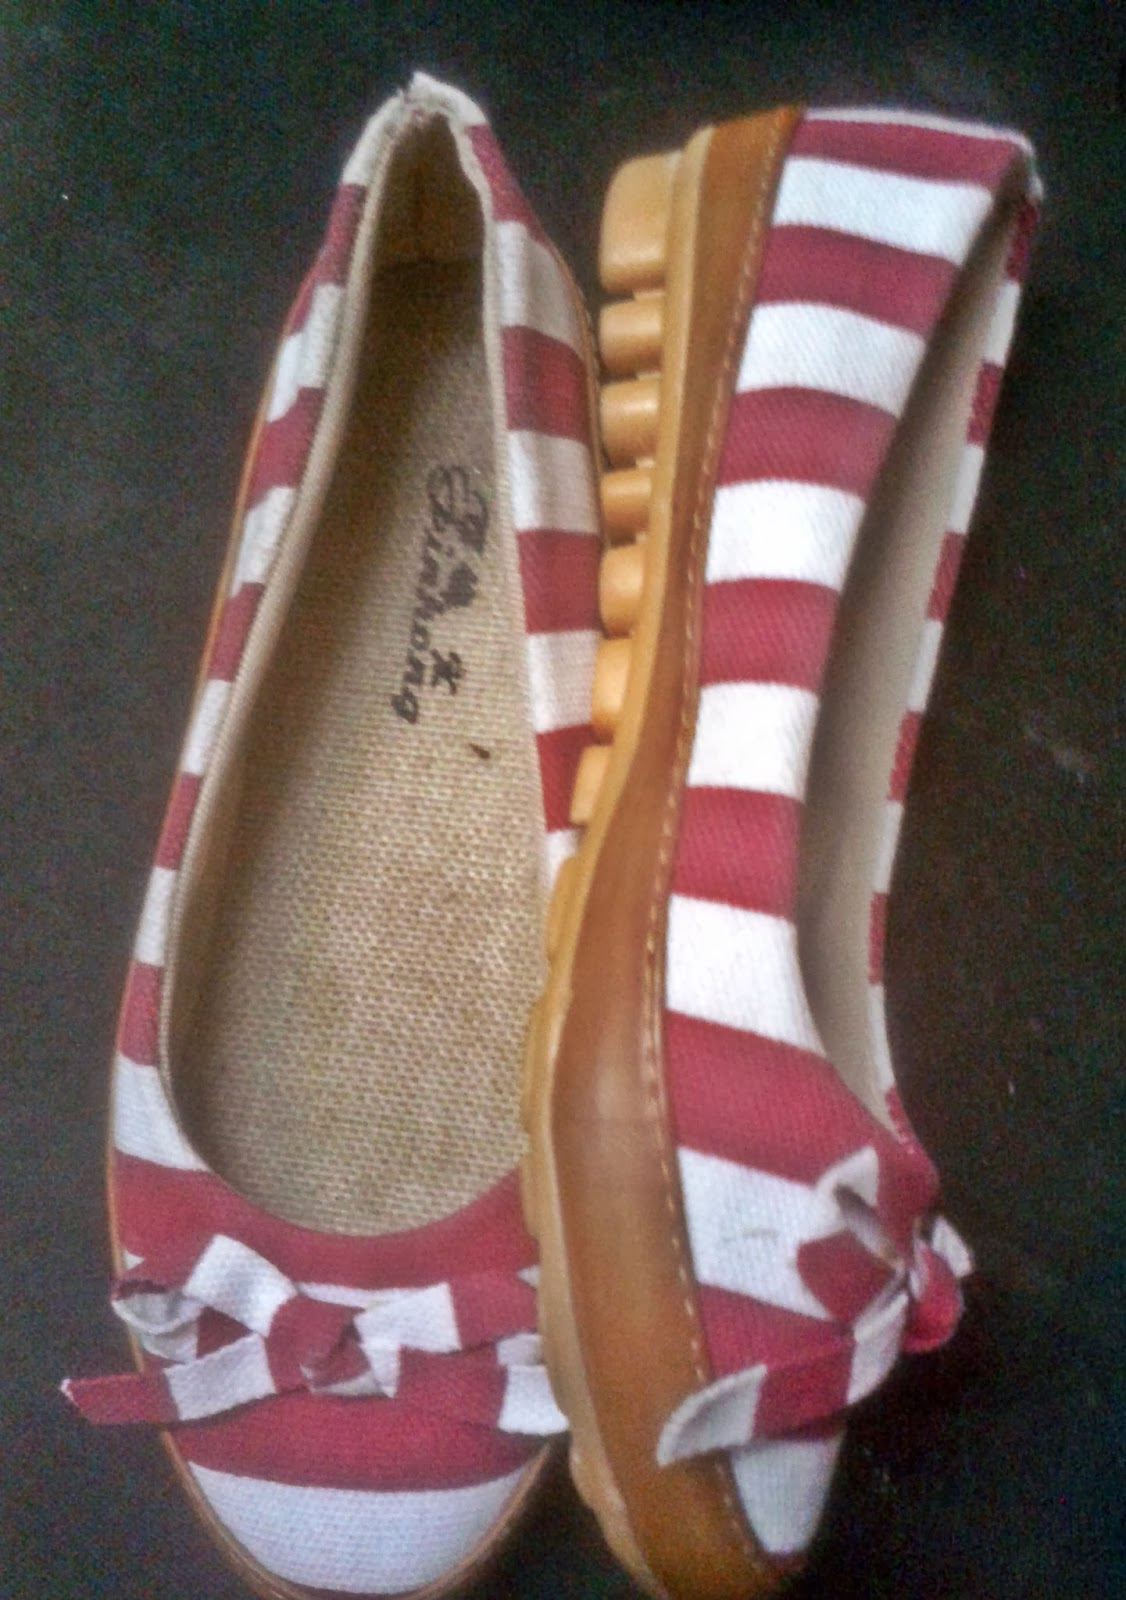 mumbai street shopping, what to buy in bandra, what to buy on hill road, shoes, street shopping, red and white stripes